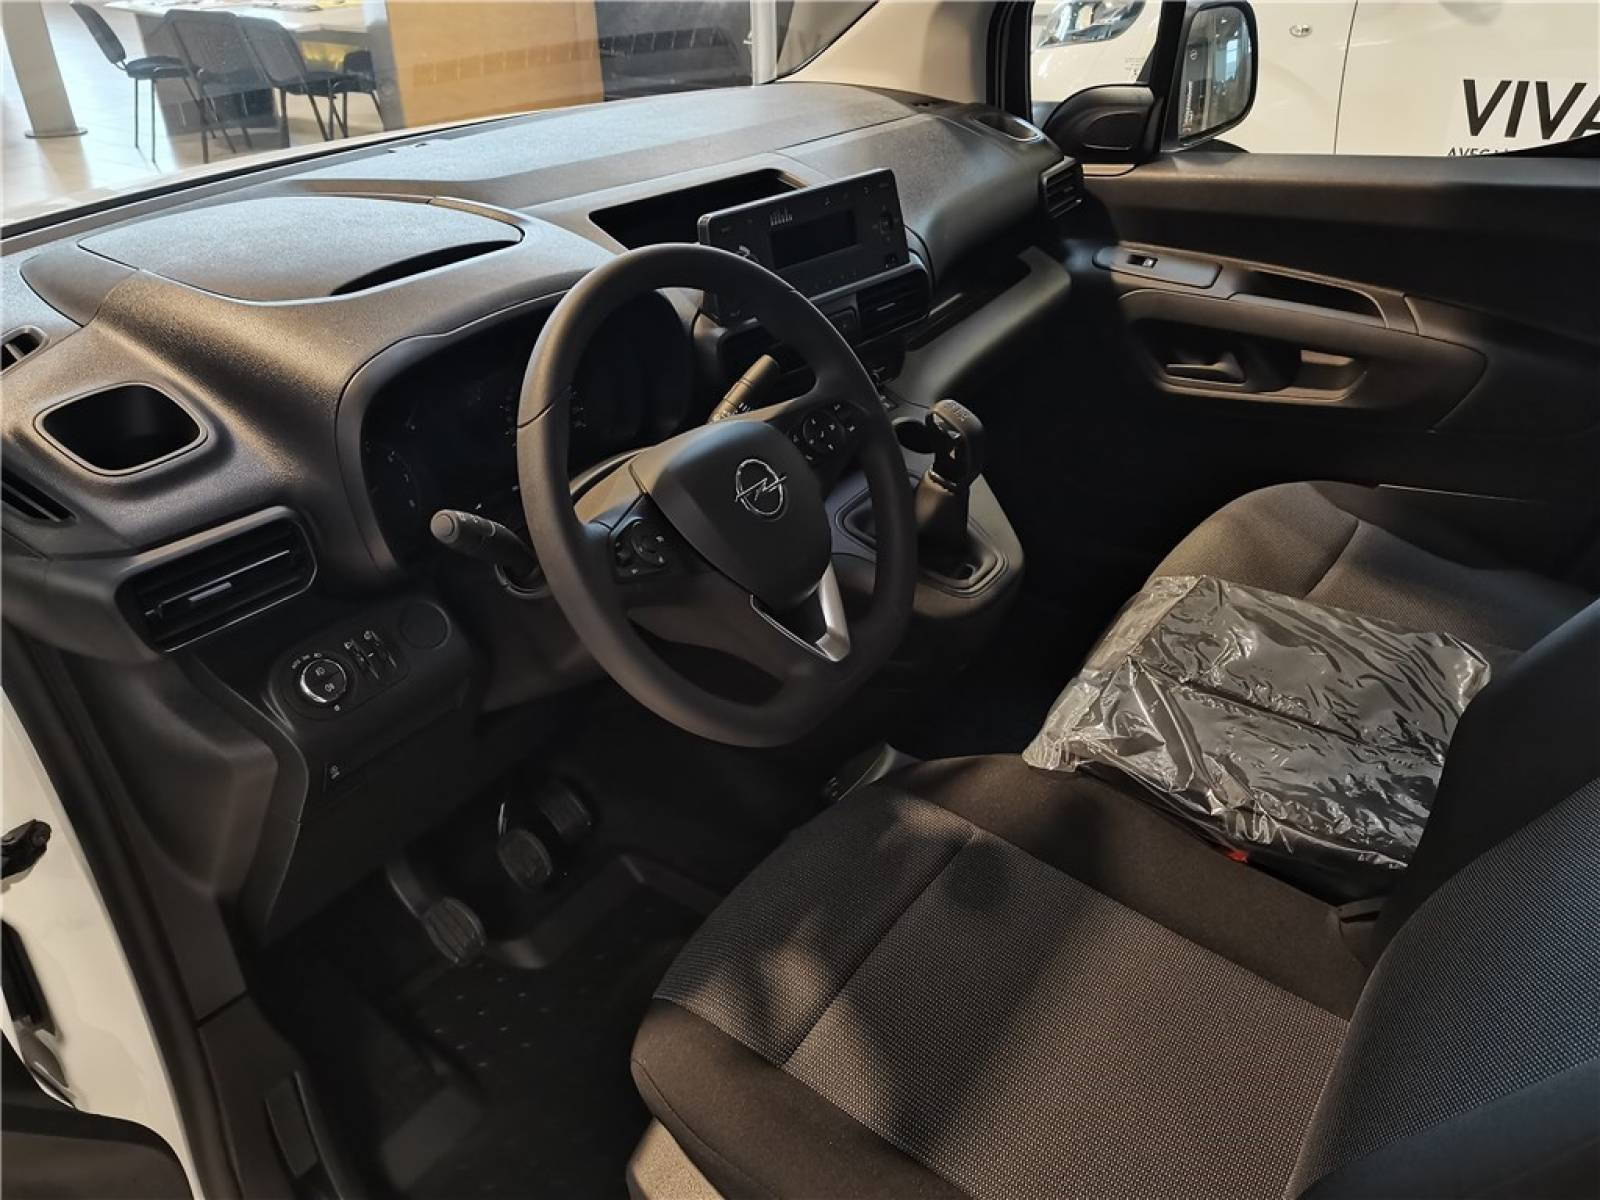 OPEL COMBO CARGO 1.5 100 CH L1H1 STANDARD - véhicule d'occasion - Groupe Guillet - Opel Magicauto - Chalon-sur-Saône - 71380 - Saint-Marcel - 7